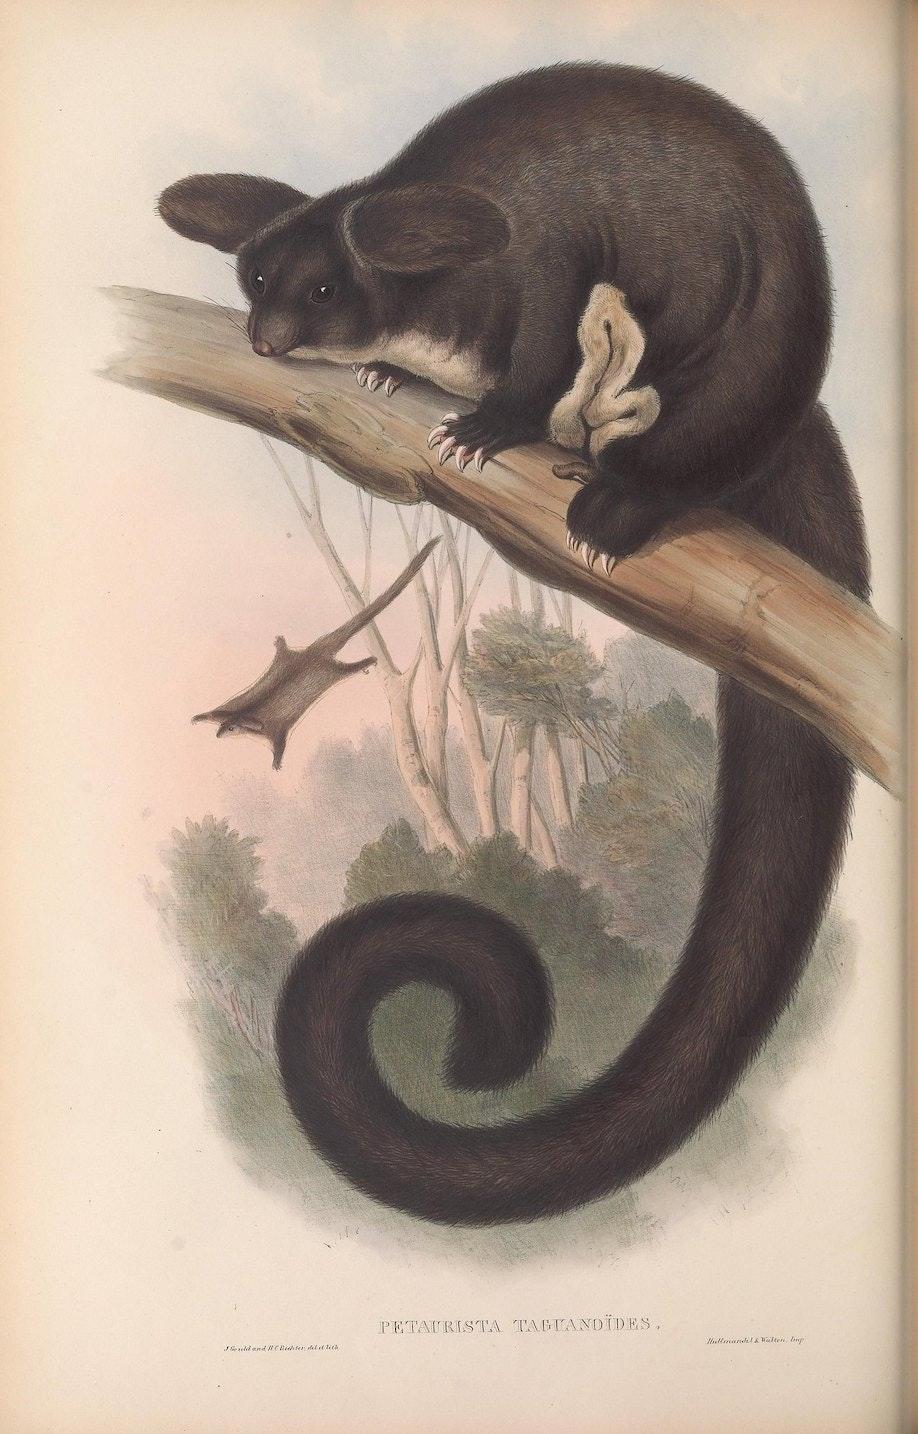 """Petaurista taguanoïdes, Flying Squirrel."""